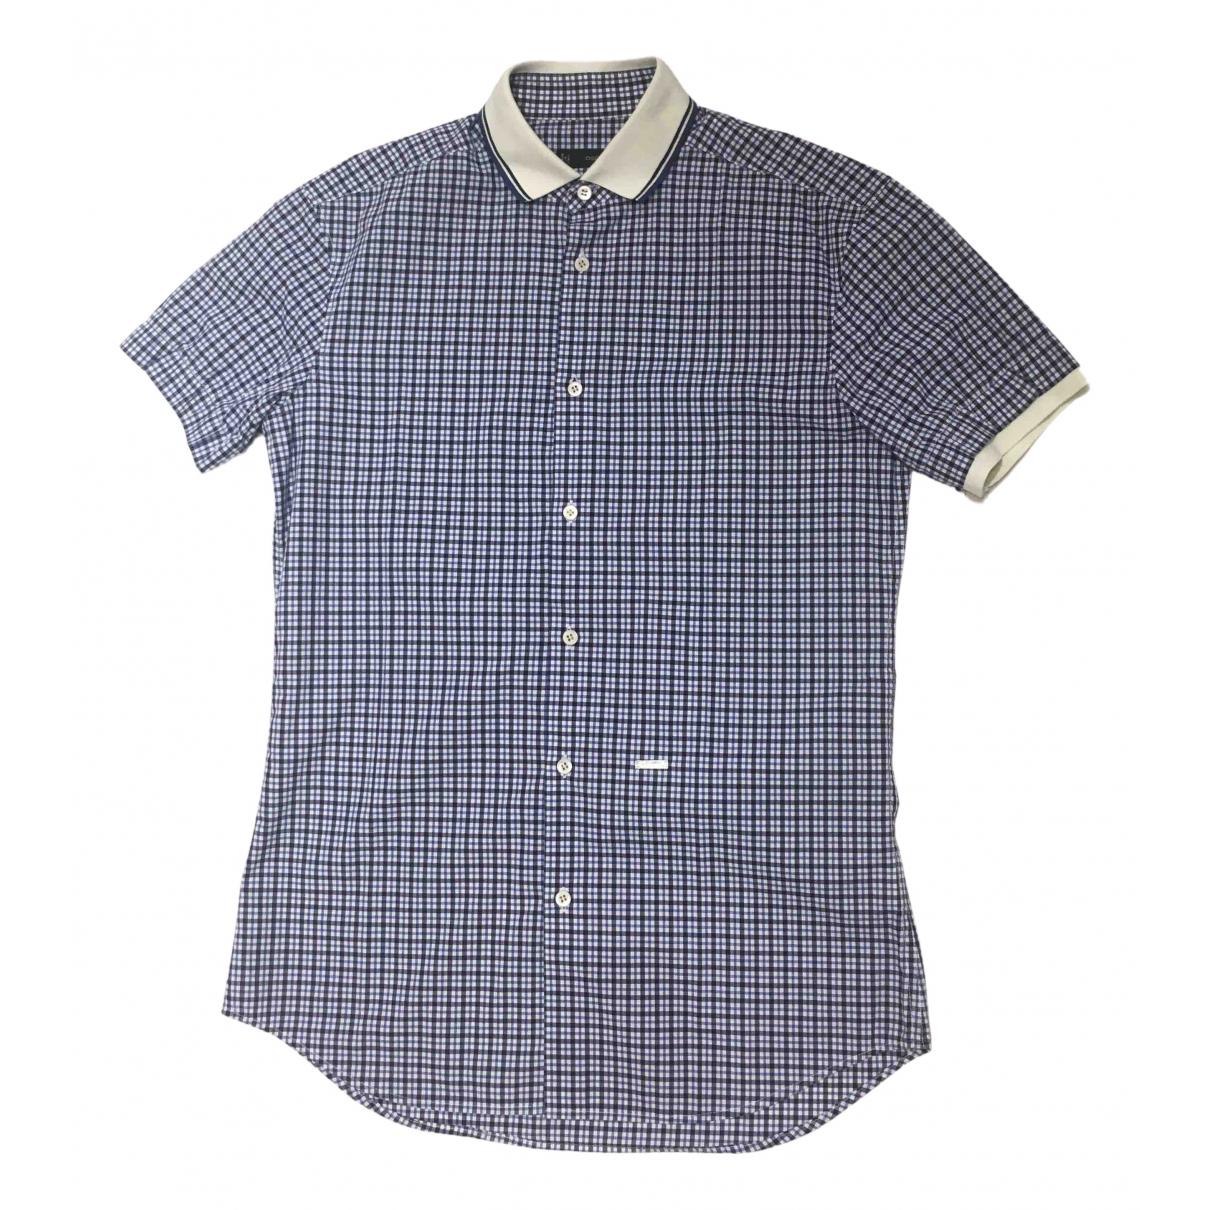 Dsquared2 \N Blue Cotton Shirts for Men M International